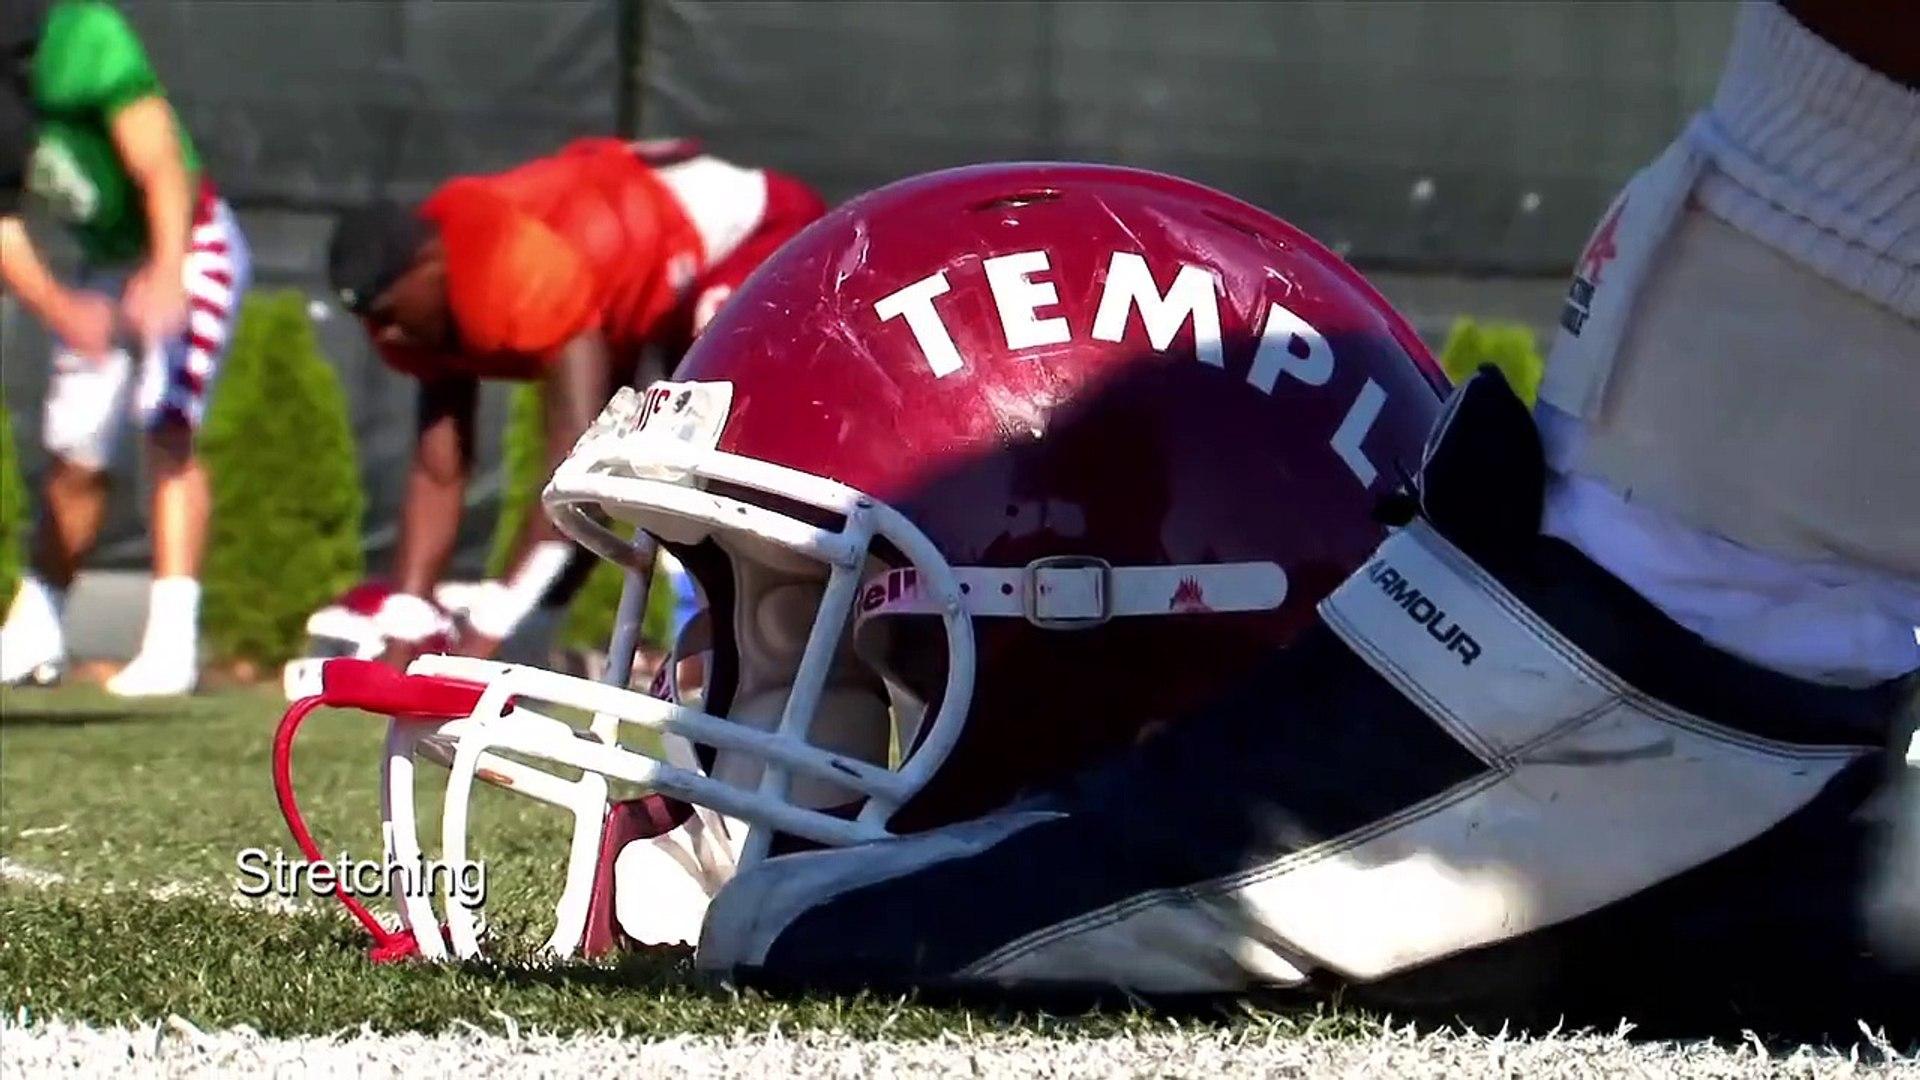 Inside Temple Football, Temple Practice